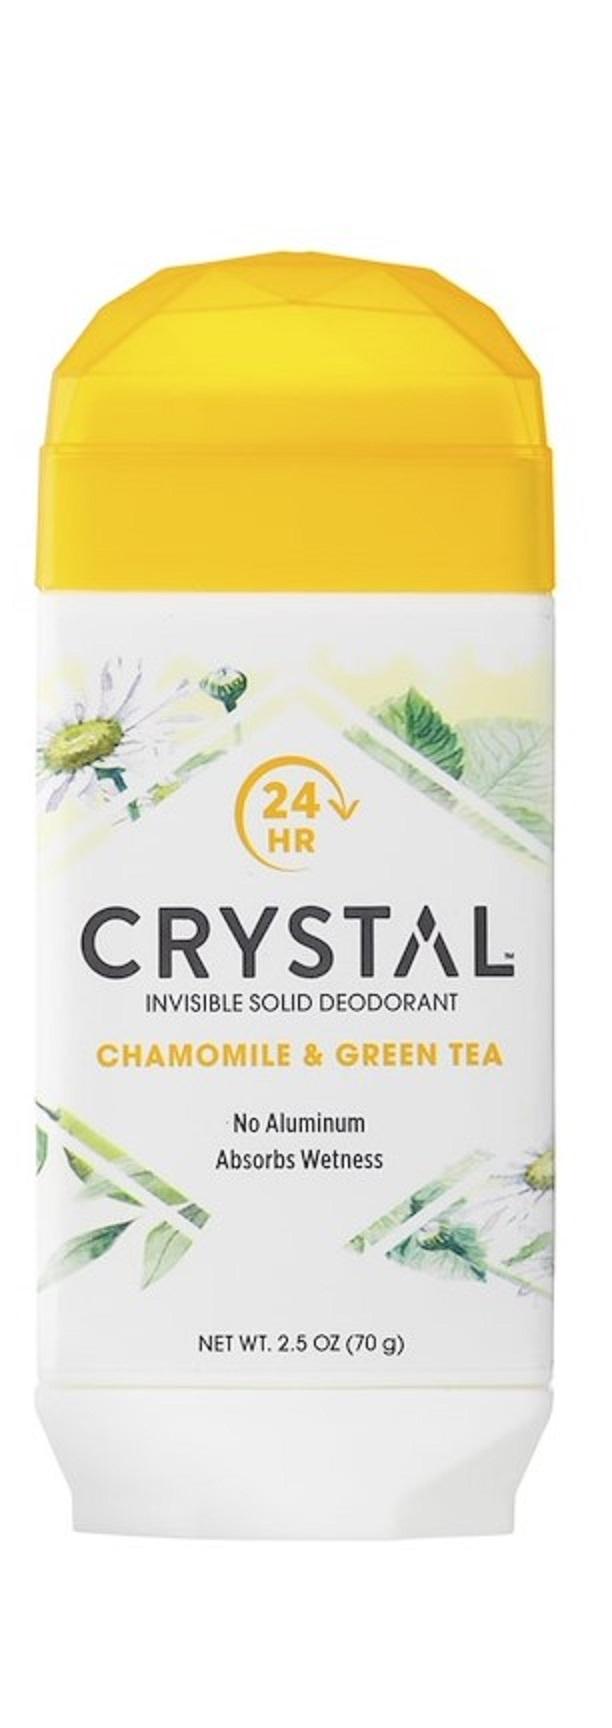 Buy Crystal Invisible Soild Deodorant - Chamomile & Green Tea 2.5 oz (70 g) Singapore